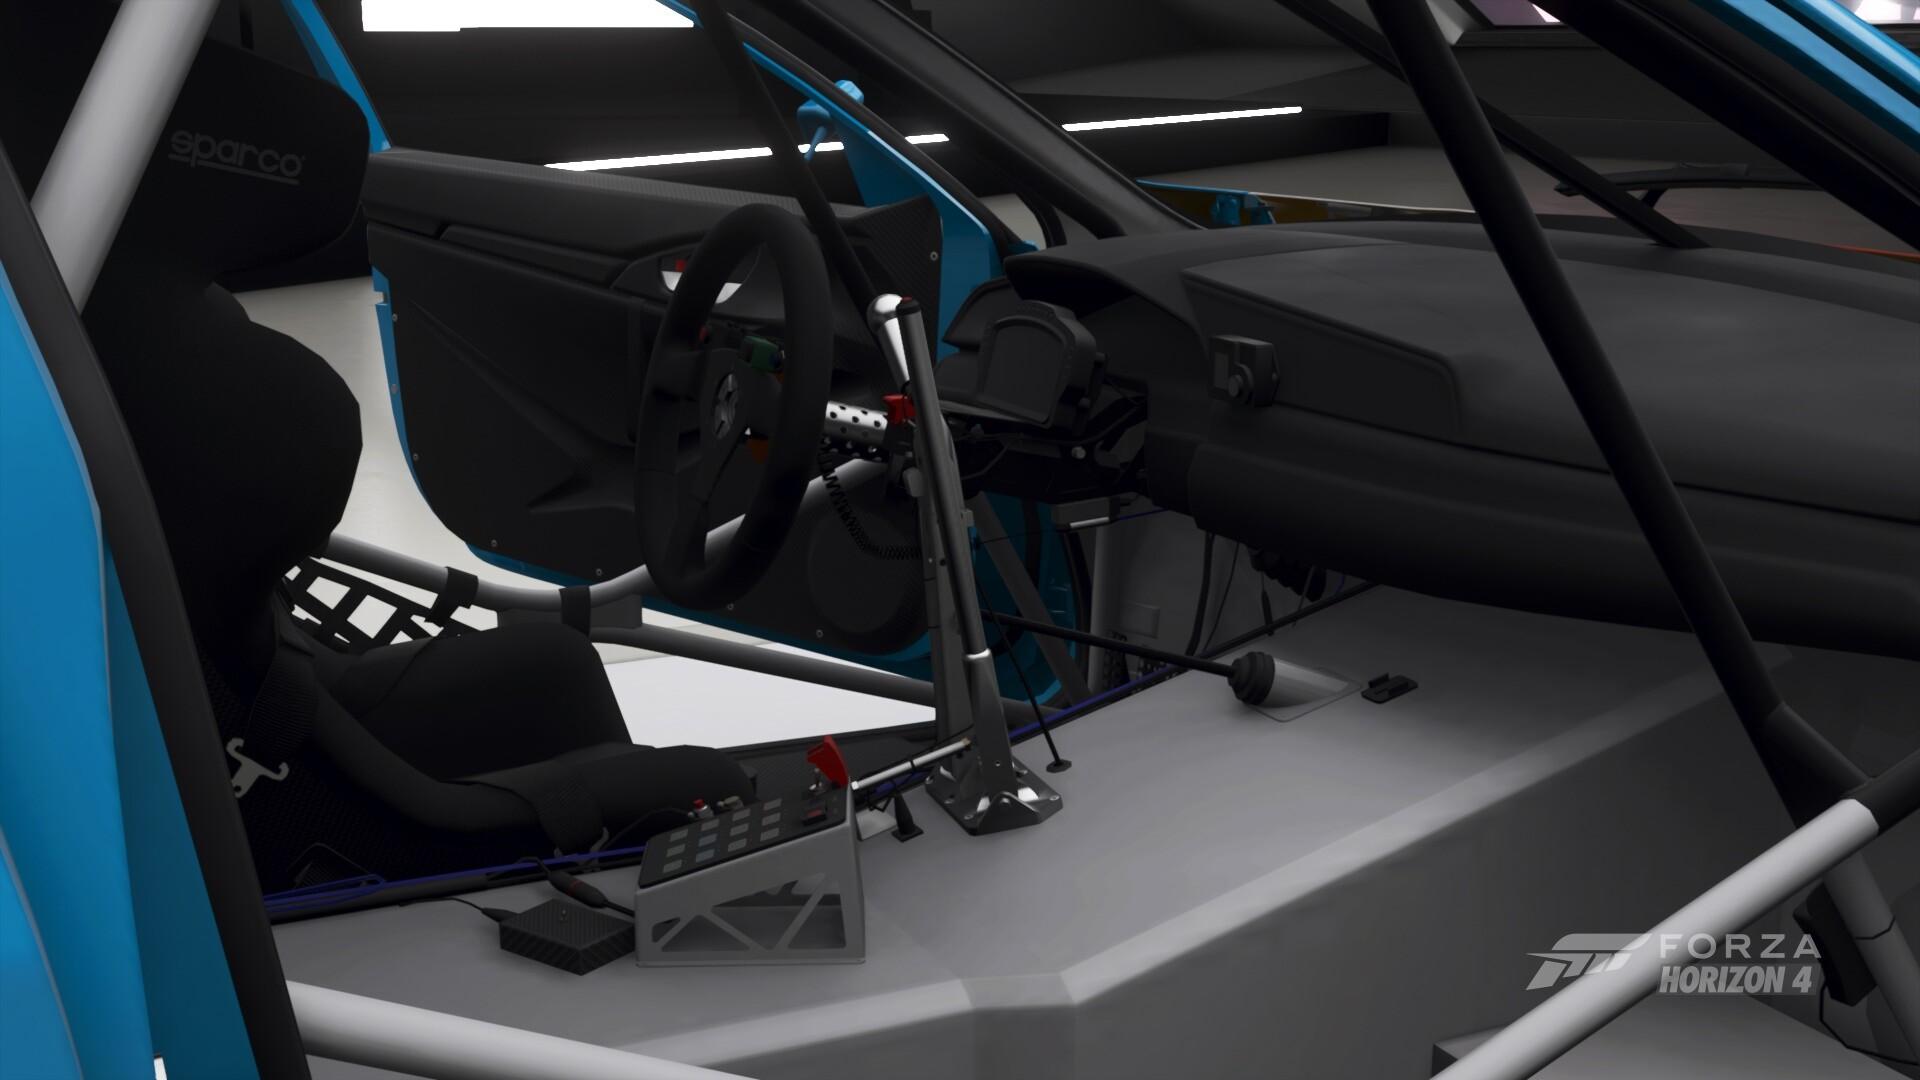 ArtStation - Honda Civic GRC - Forza Horizon 4, Bijoy Shah